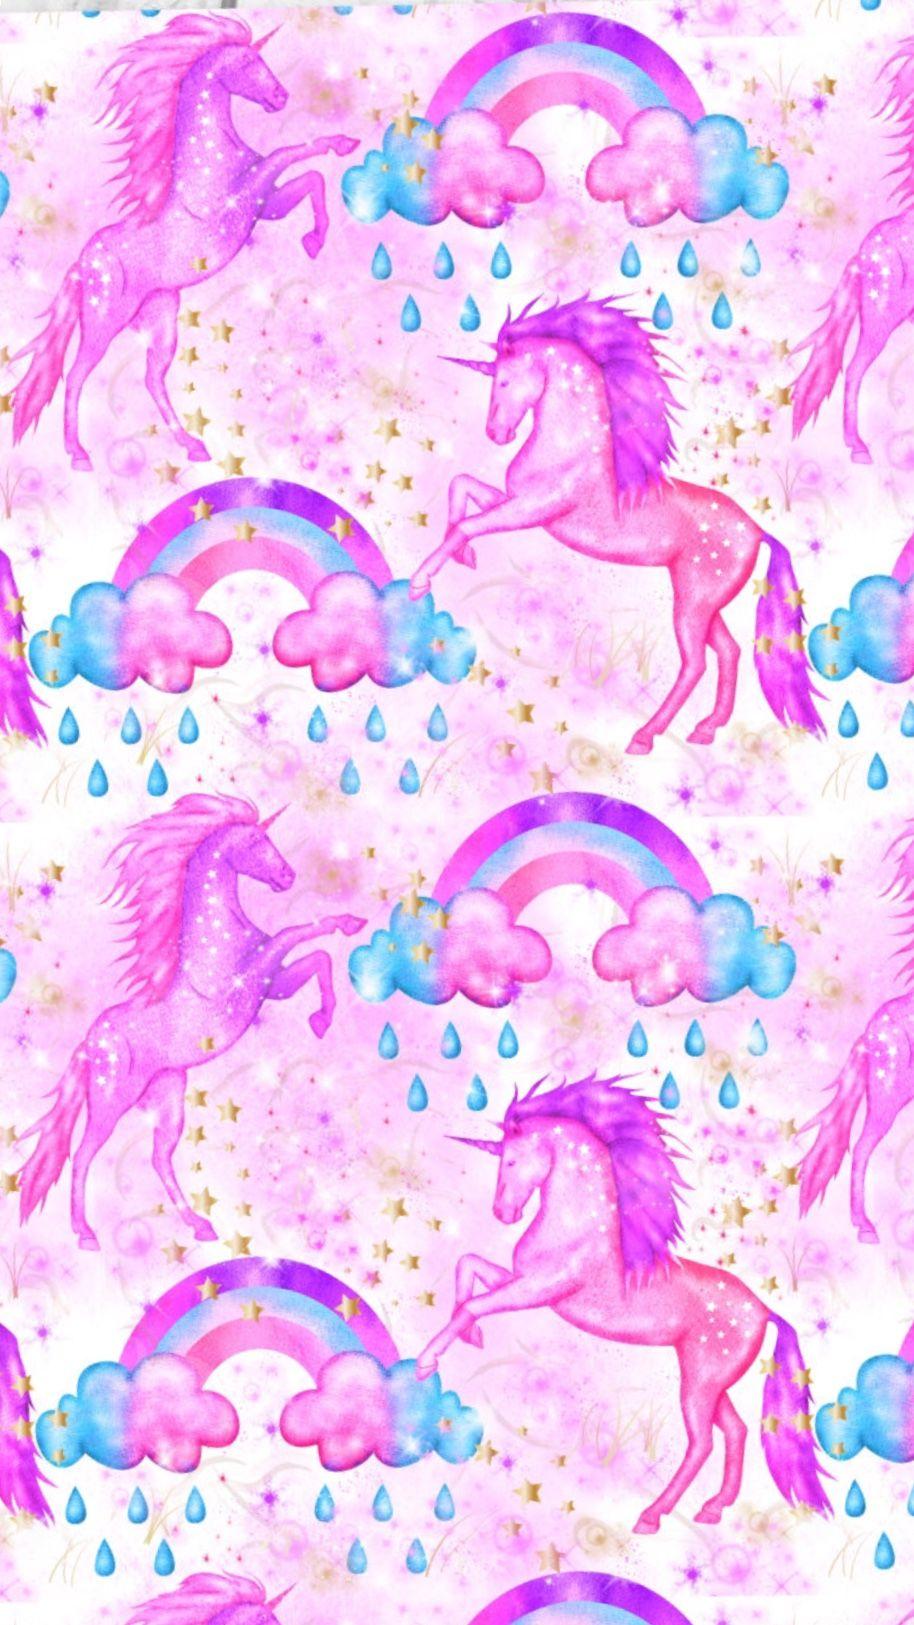 Unicorn Rainbows Unicorn Wallpaper Unicorn Wallpaper Cute Pink Unicorn Wallpaper